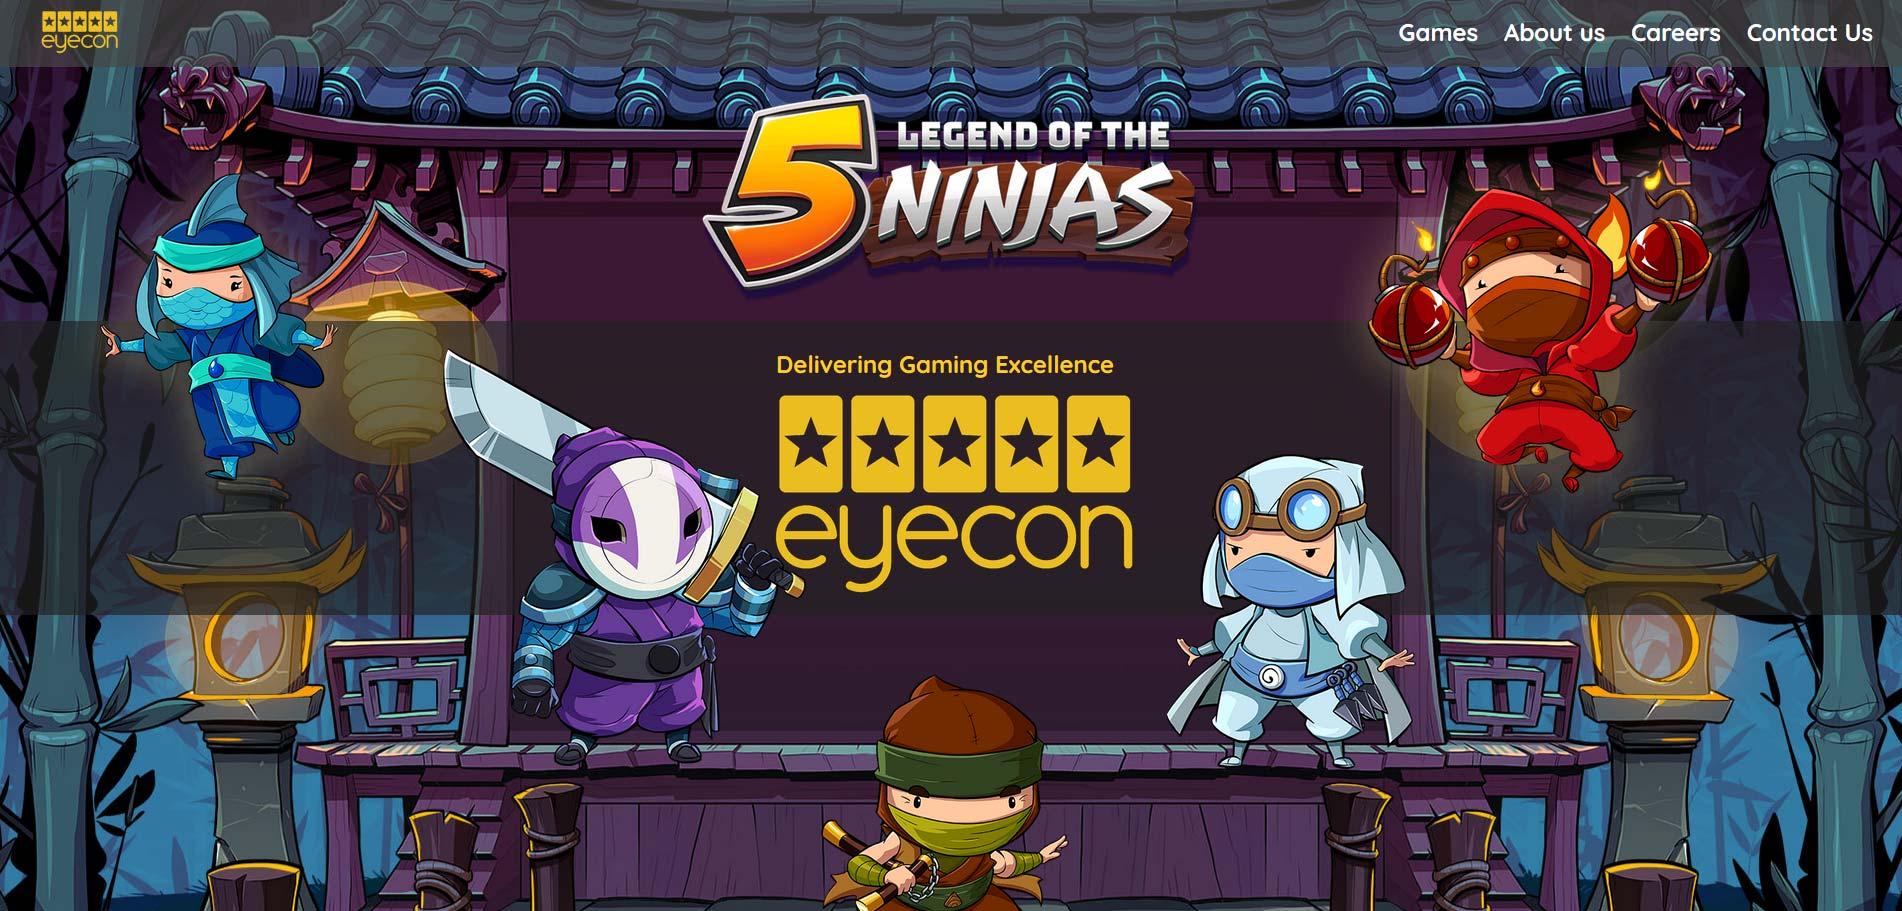 Eyecon Screenshot legend of the 5 ninjas